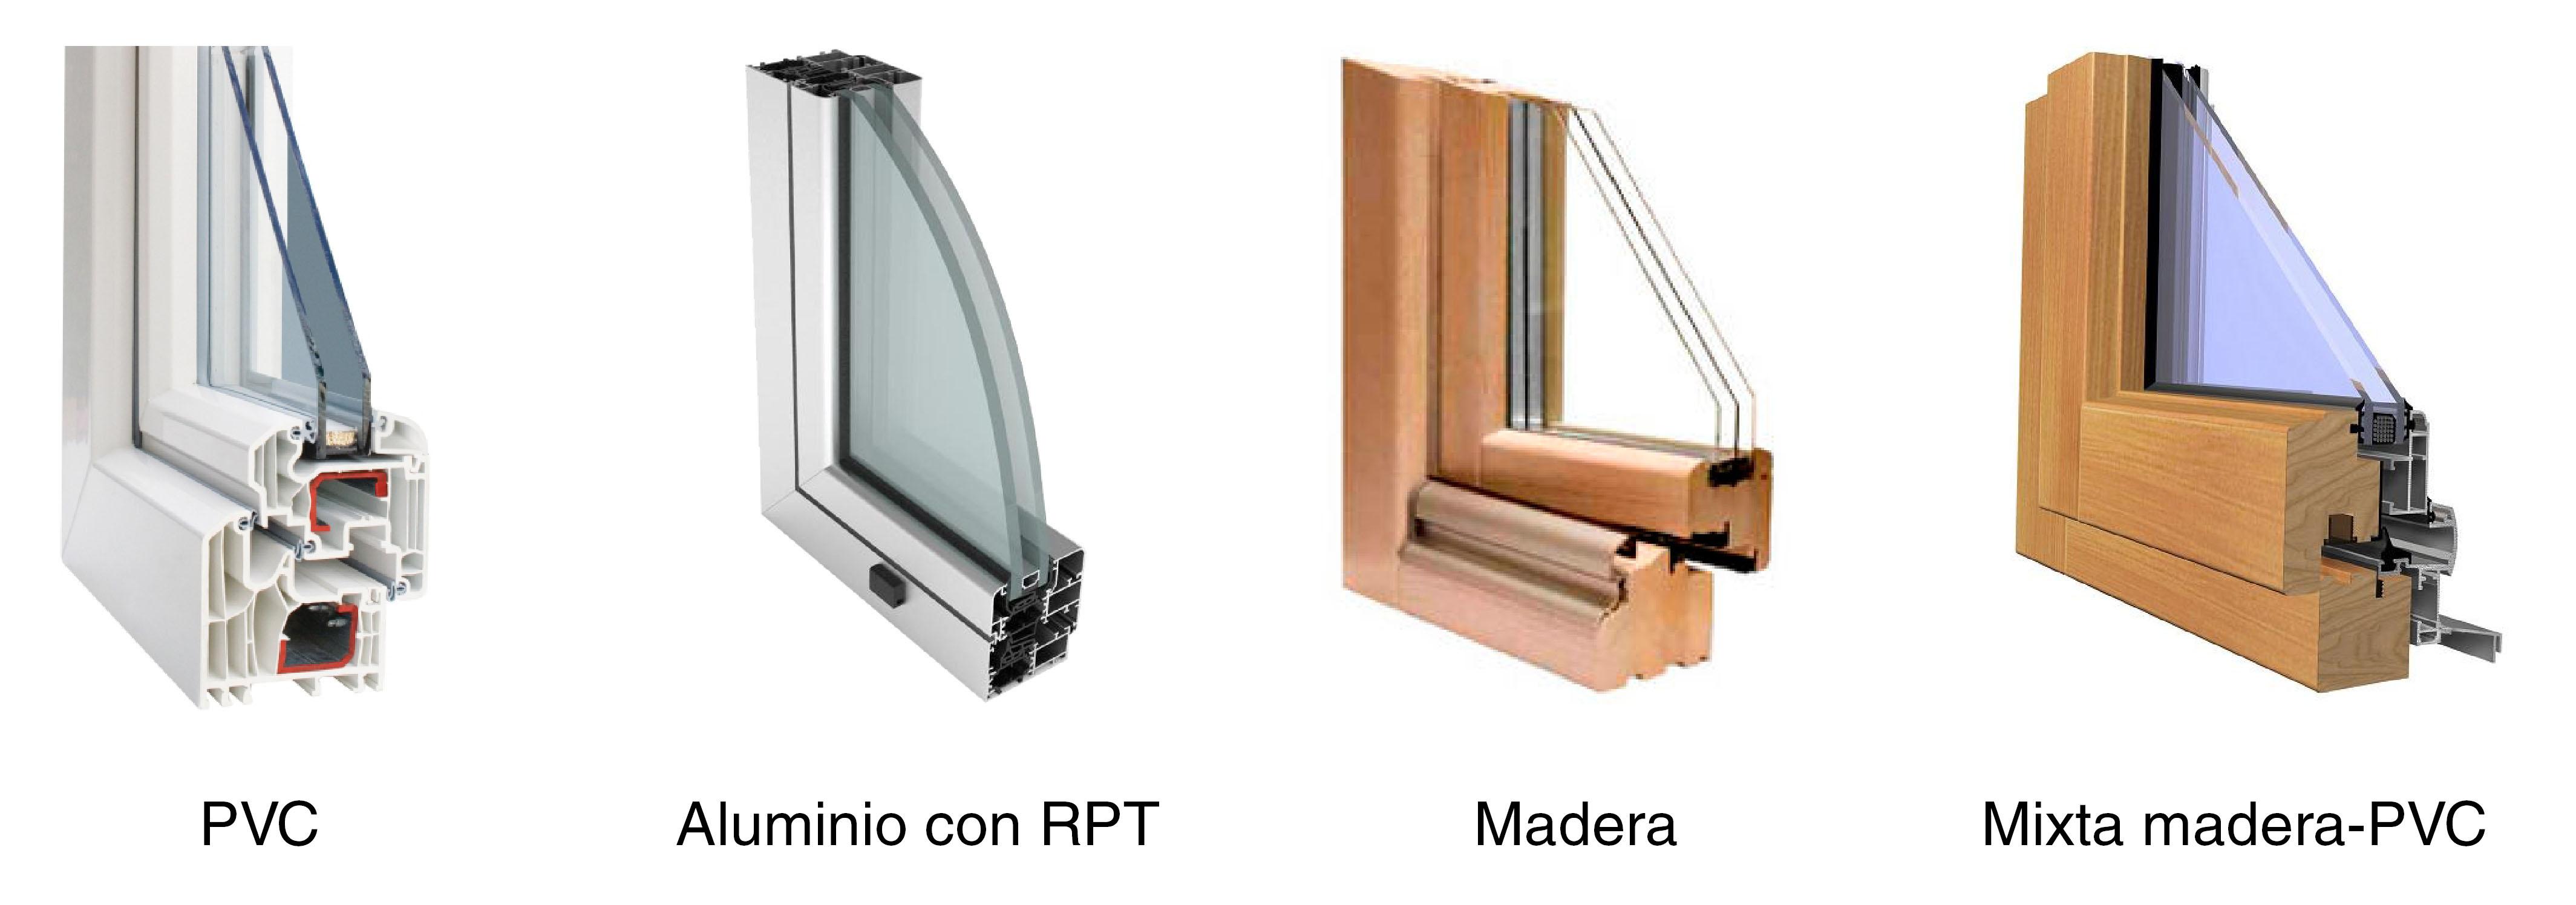 Marco Ventana Aluminio. Elegant Ventana Aluminio Rpt Corredera Hojas ...